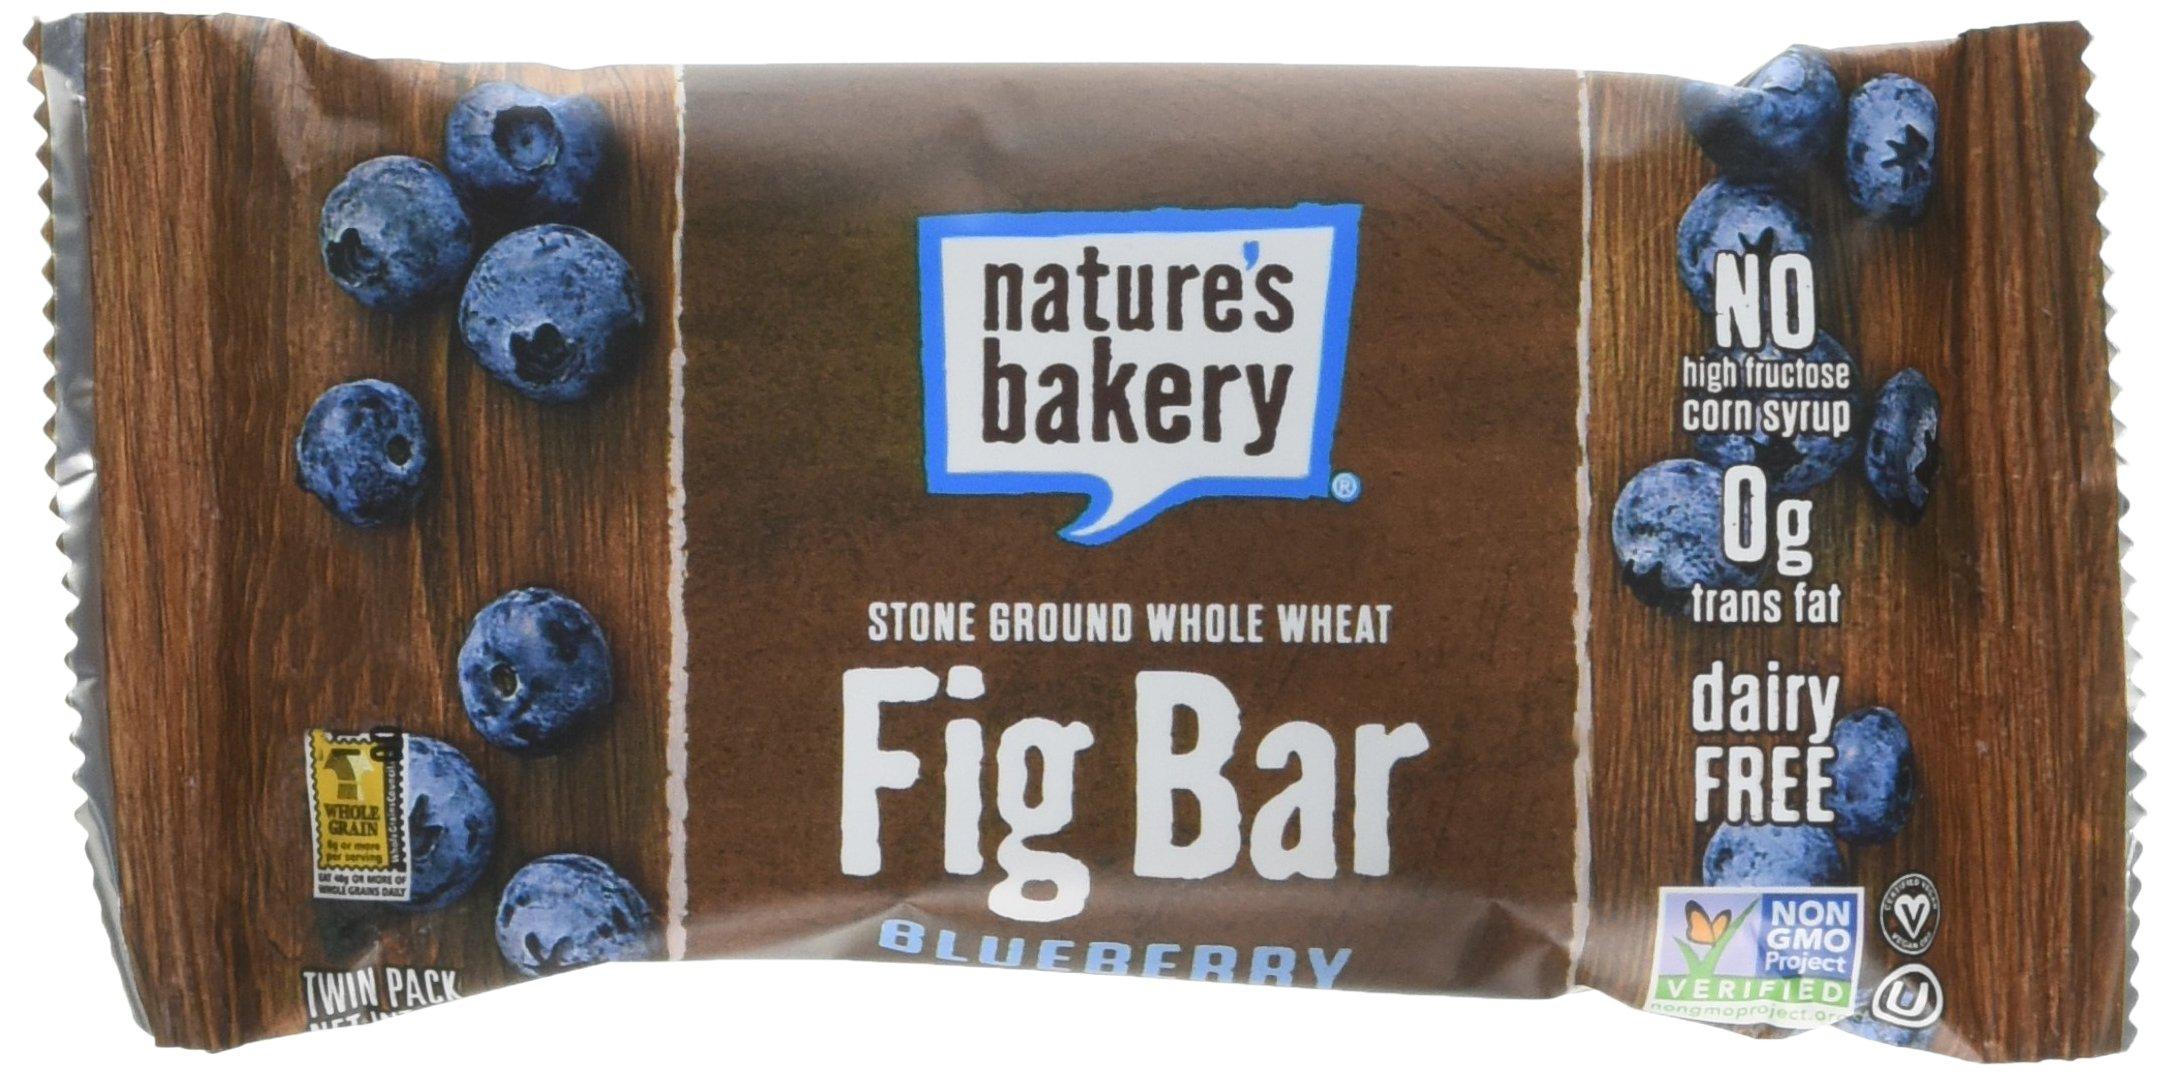 NATURE'S BAKERY, Whole Wheat Fig Bar, Blueberry, Pack of 6, Size 6/2 OZ, (Kosher)